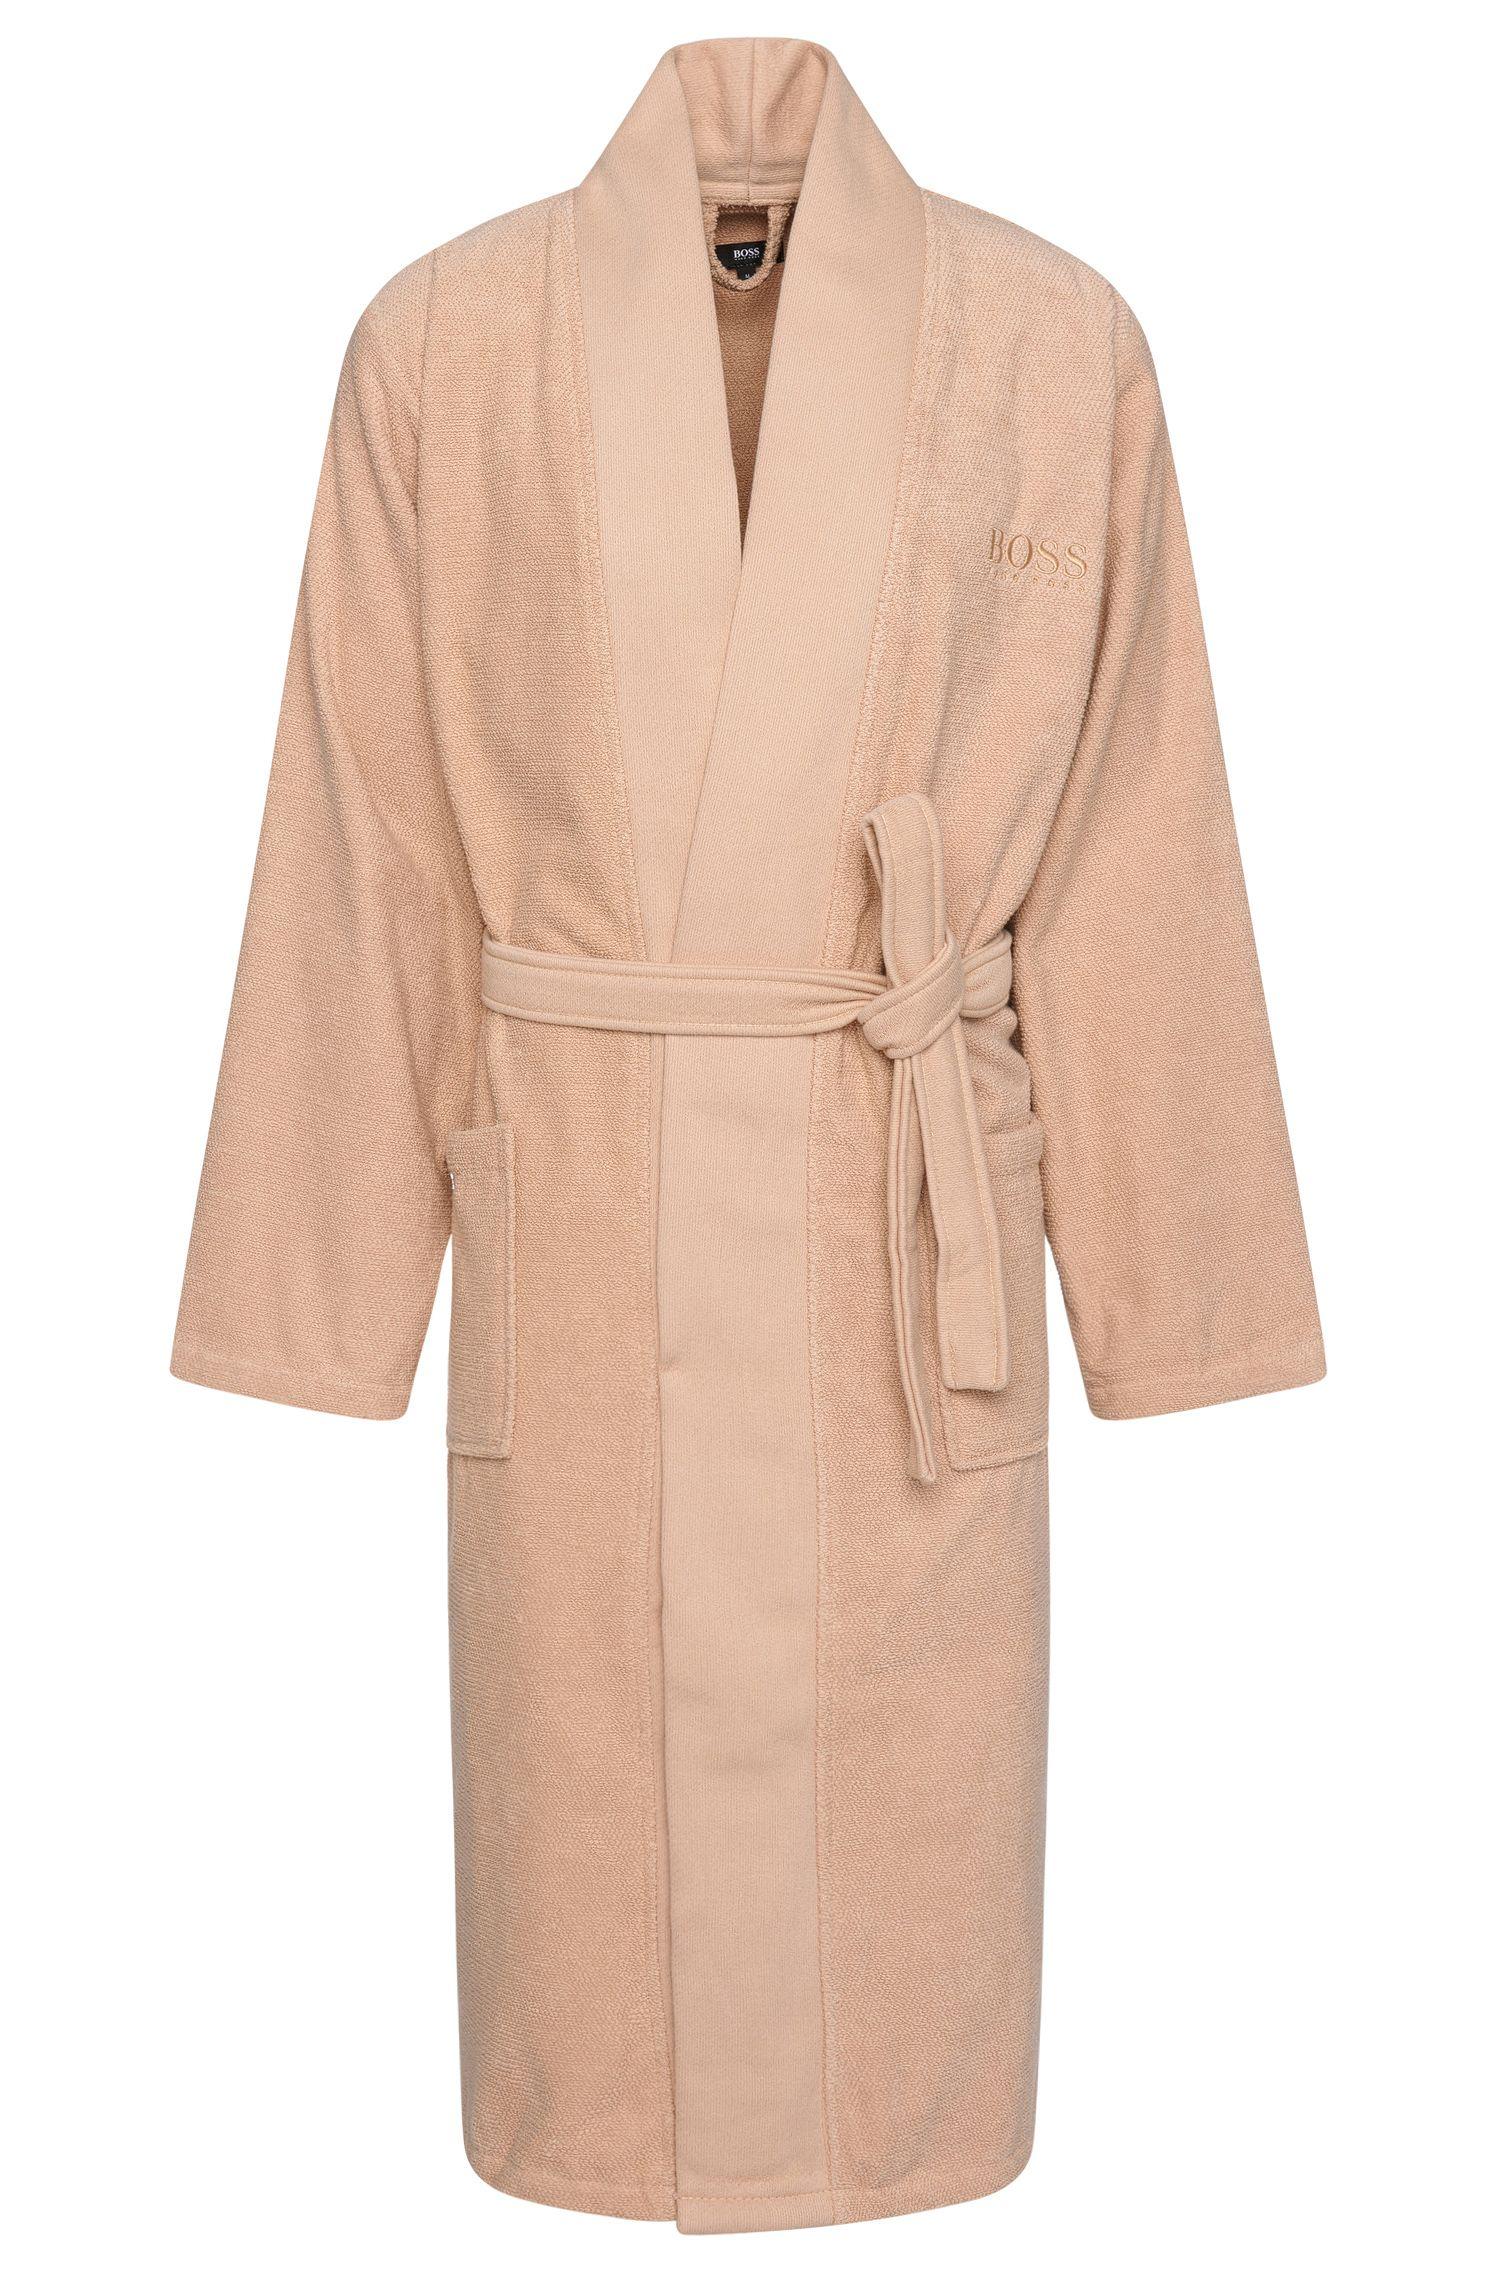 Kimono-style bathrobe in combed Aegean cotton, Beige